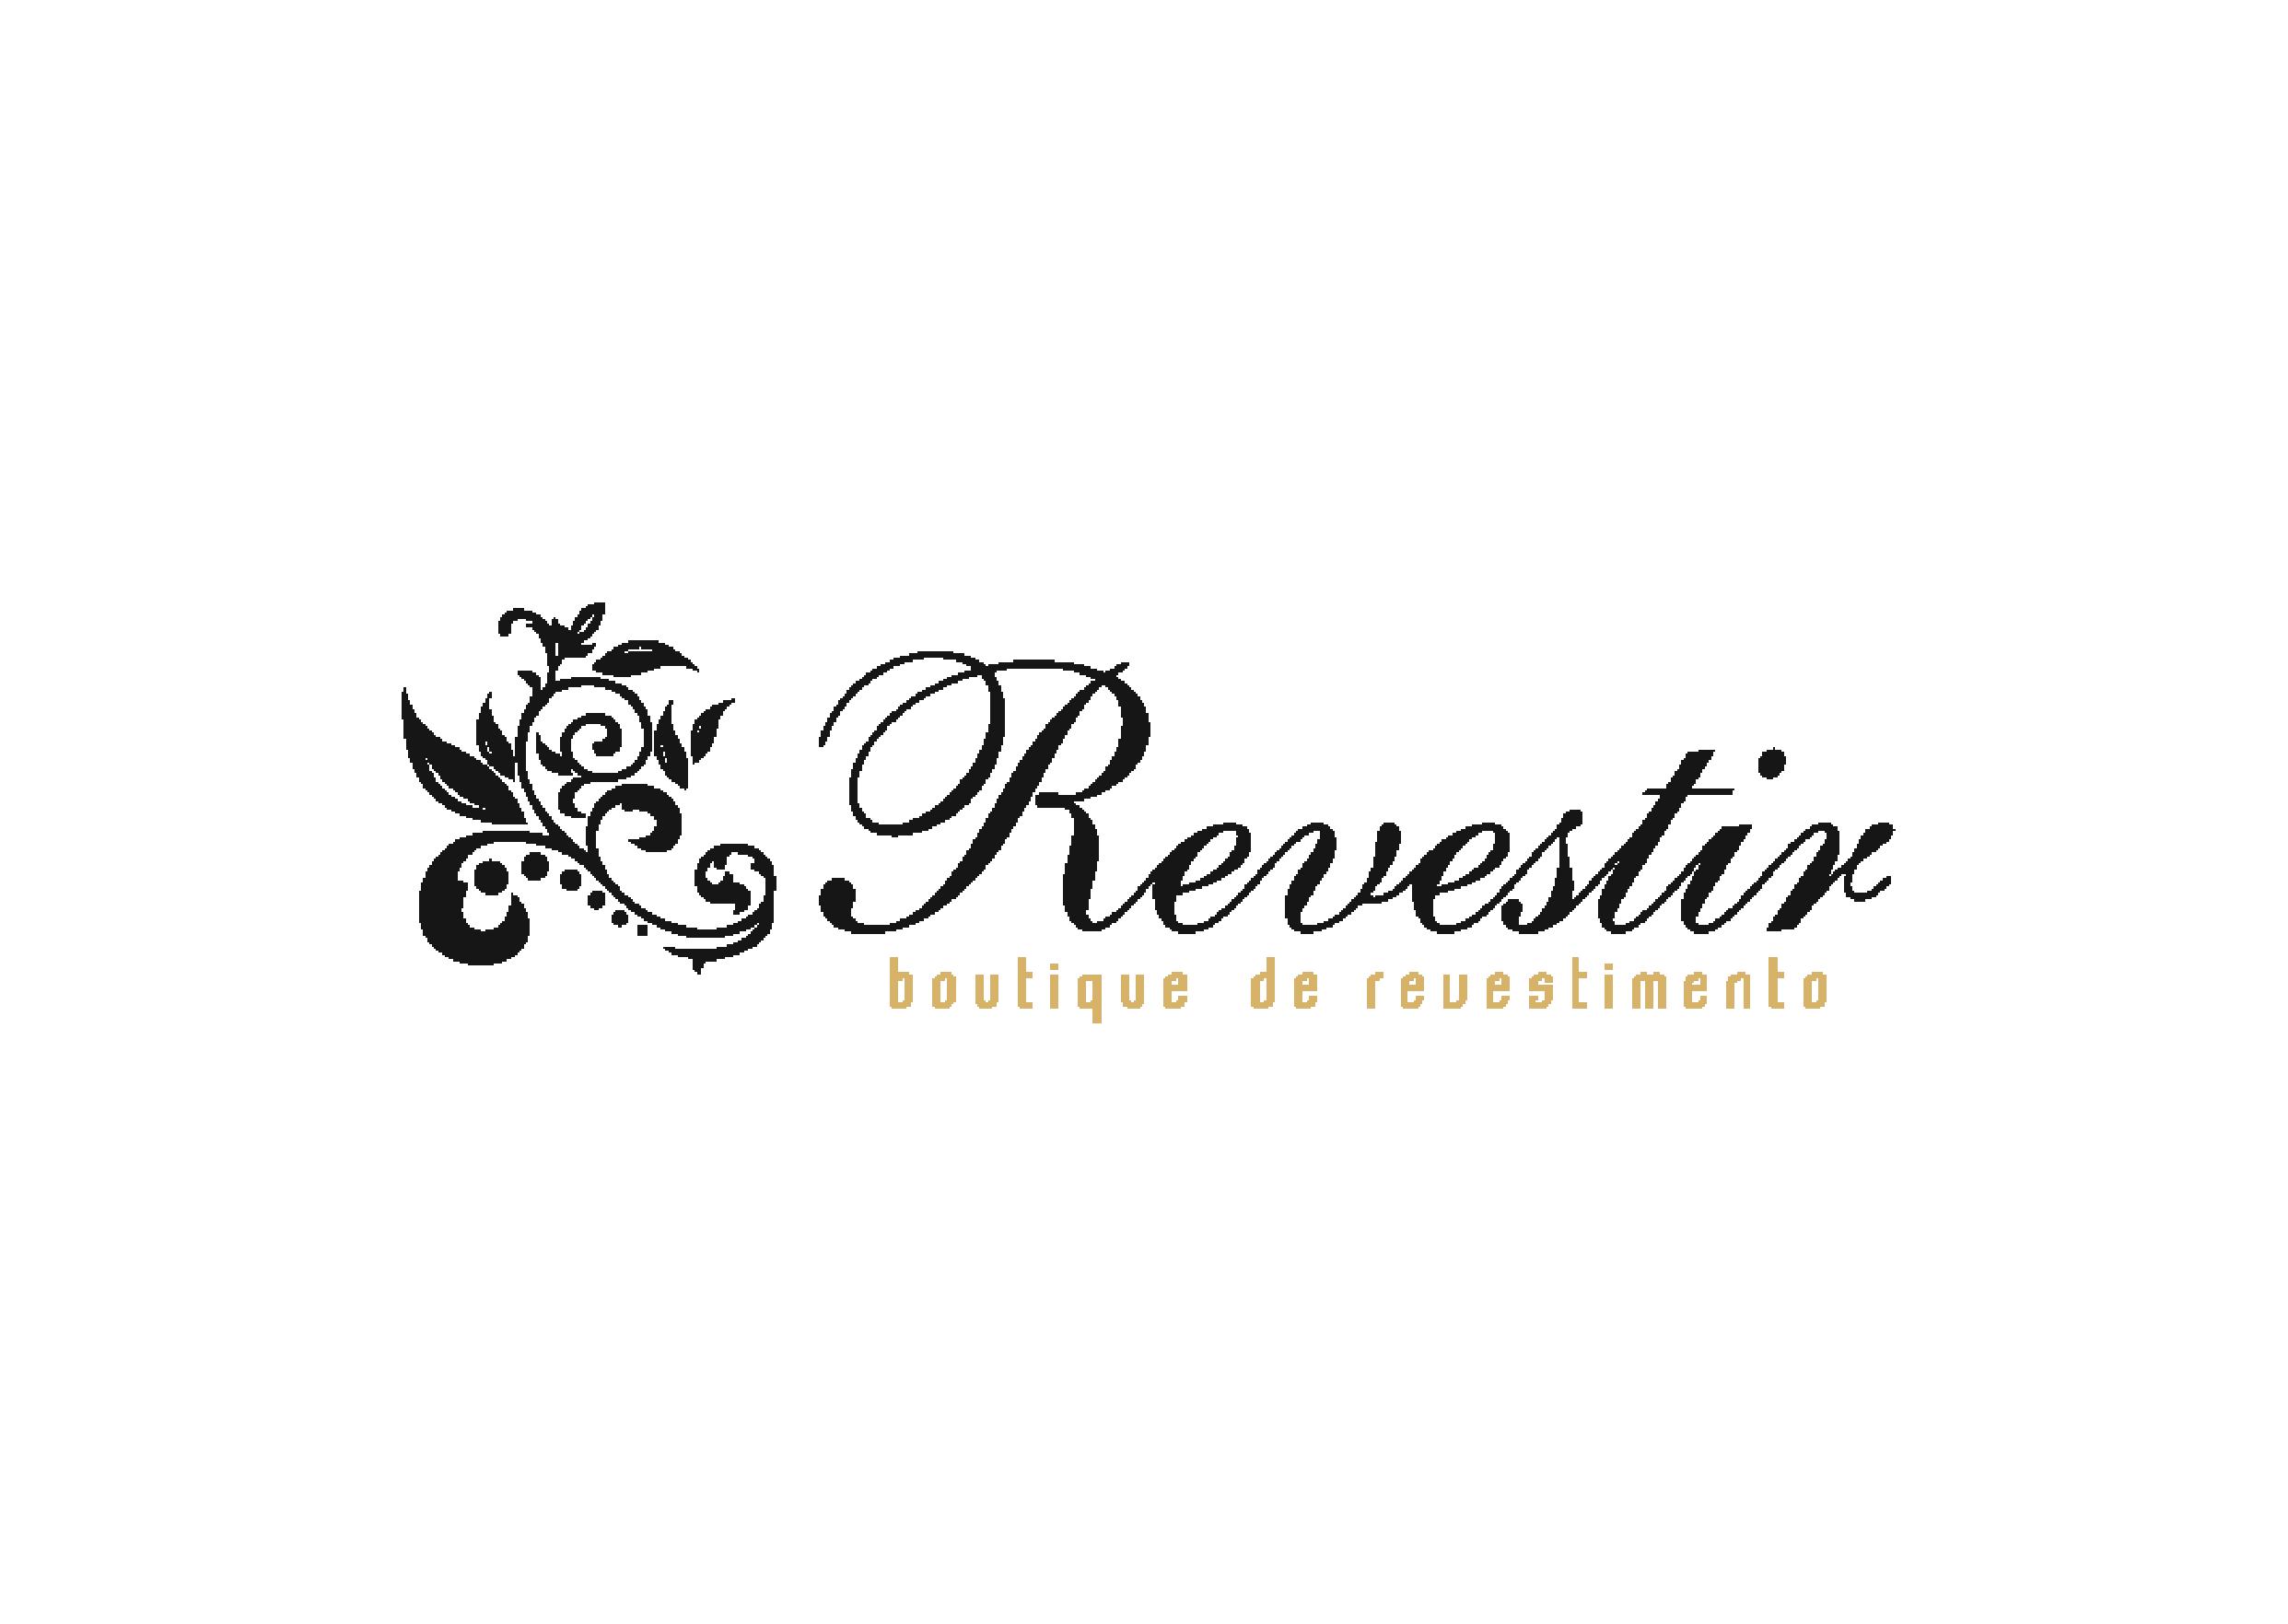 revestir_Prancheta 1